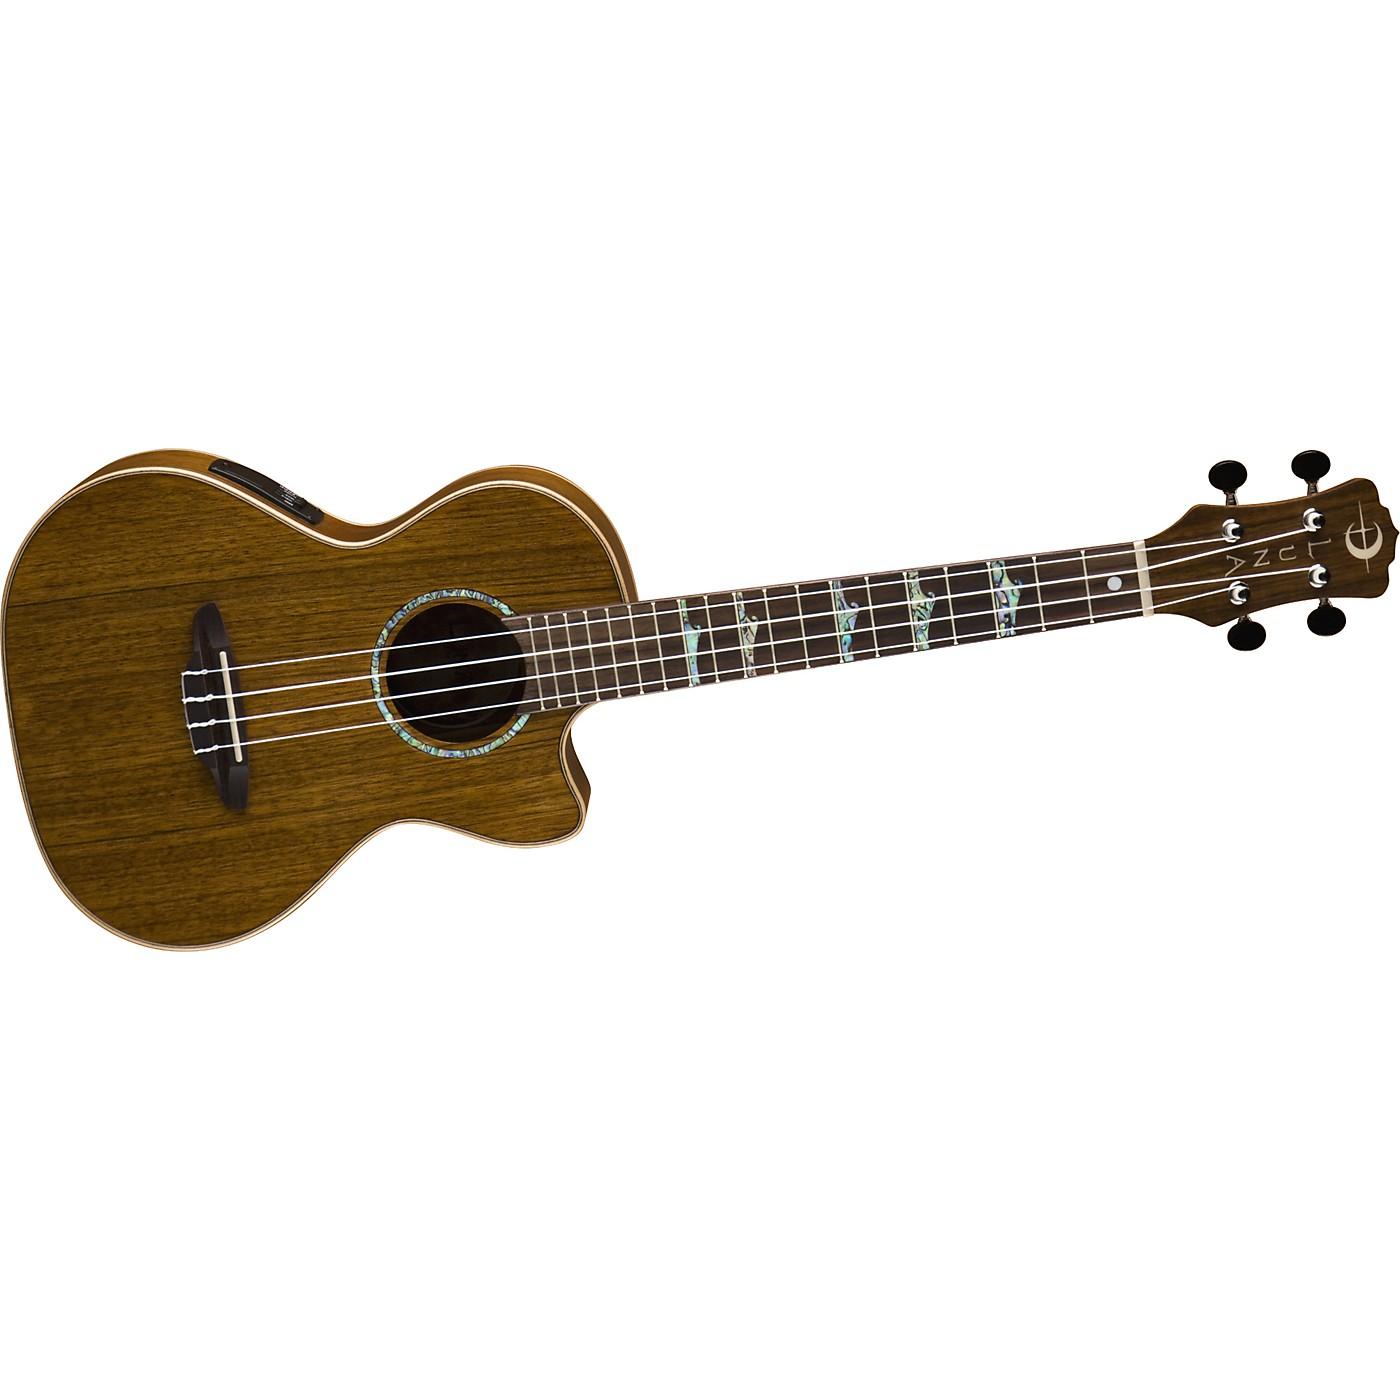 Luna Guitars High-Tide Ovangkol Tenor Ukulele thumbnail